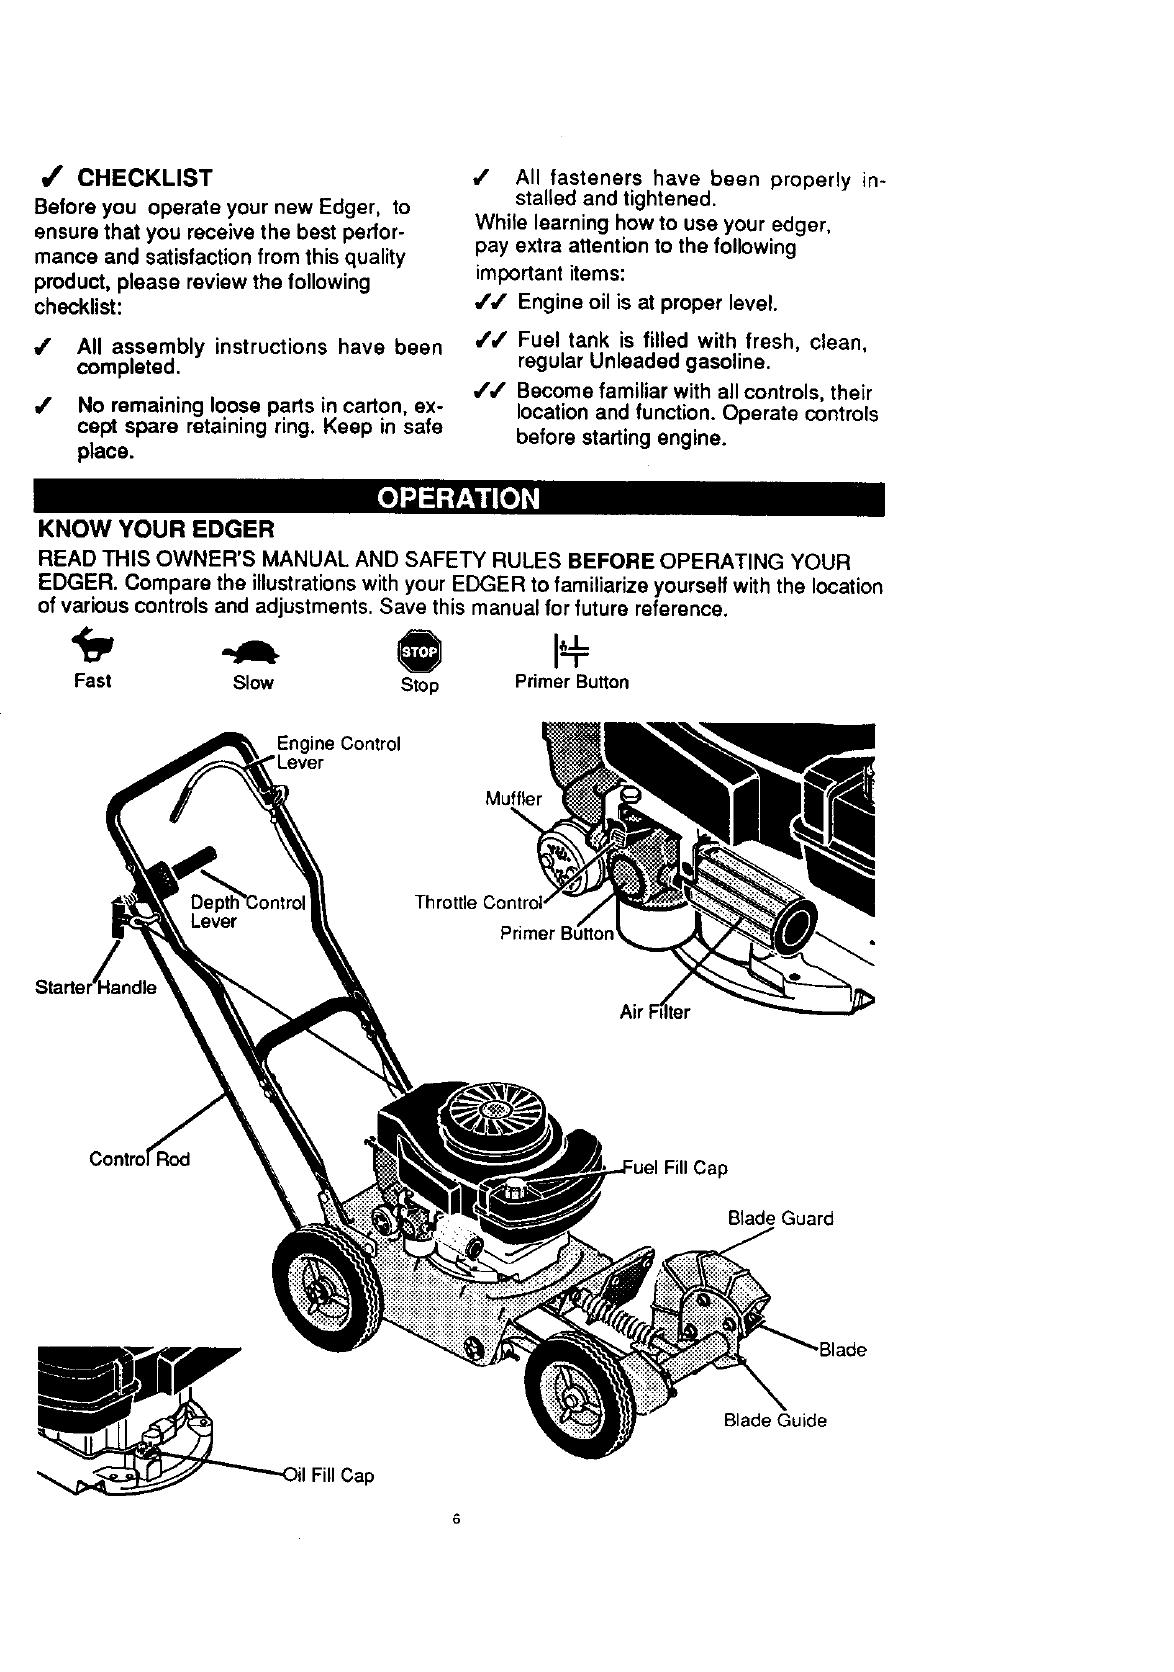 Craftsman 536797460 User Manual 3.5 HP 9 EDGER Manuals And